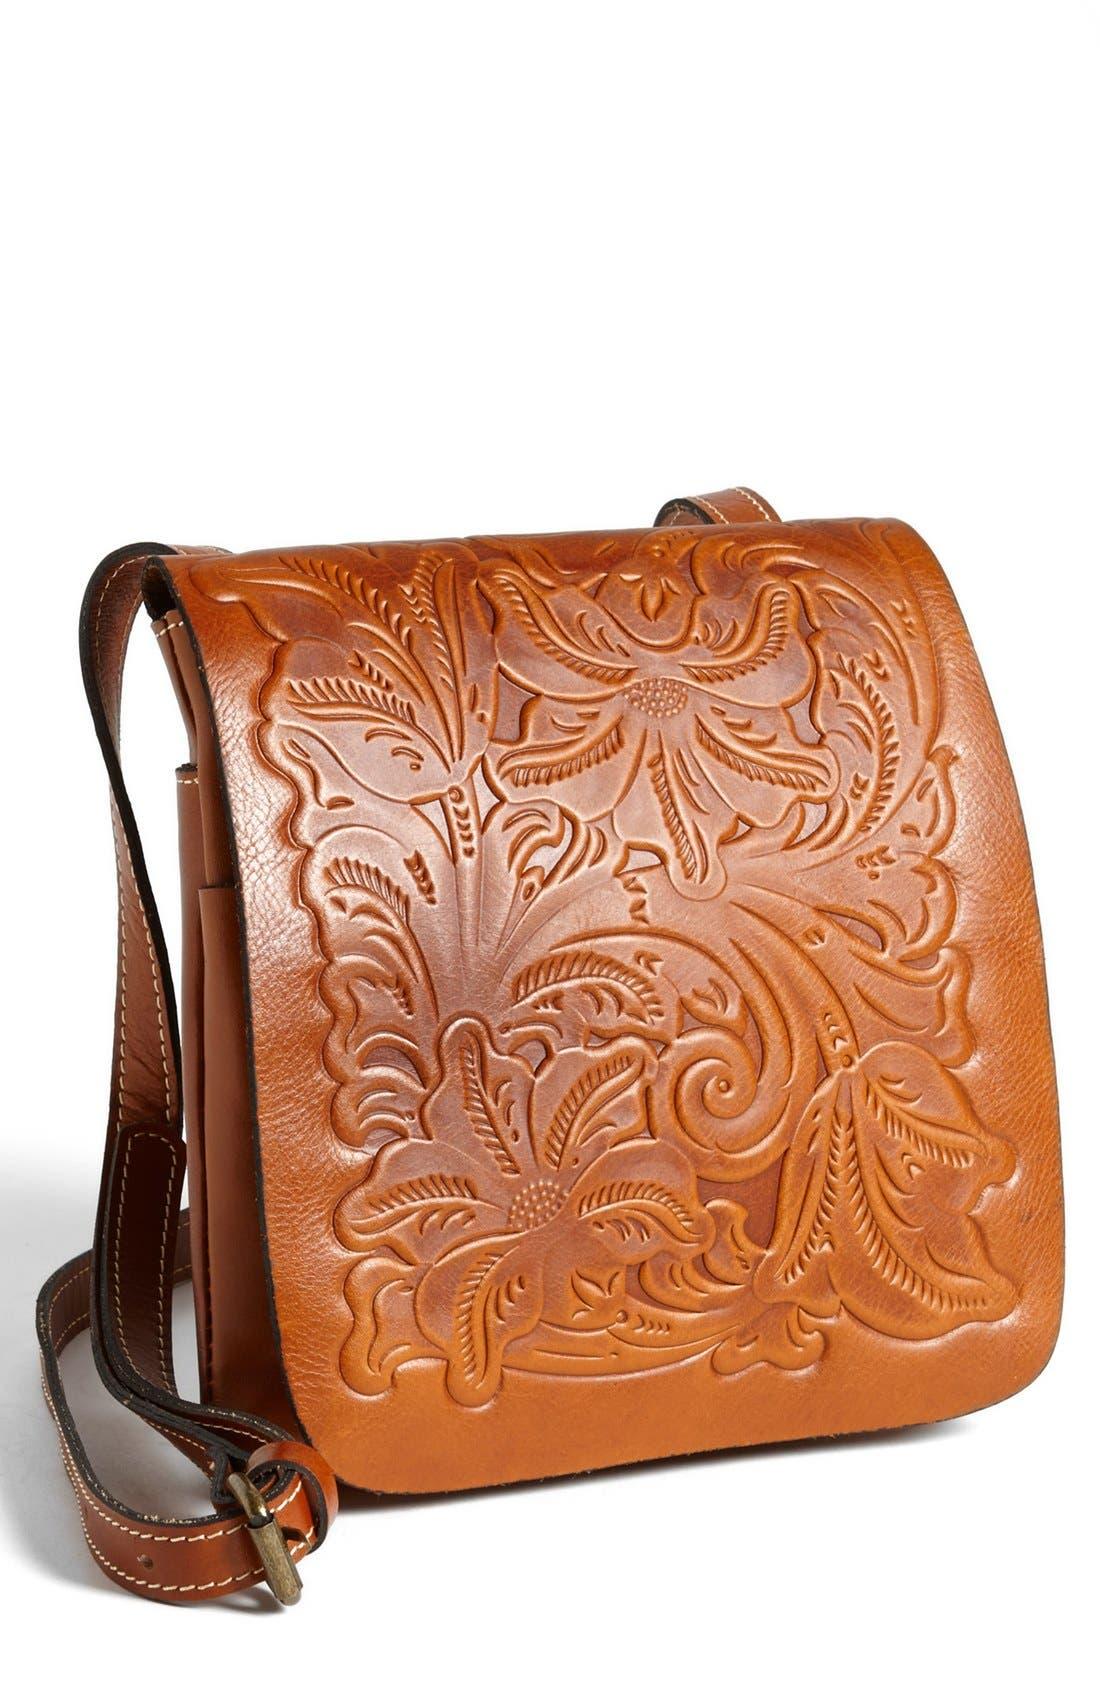 Main Image - Patricia Nash 'Granada' Embossed Leather Crossbody Bag